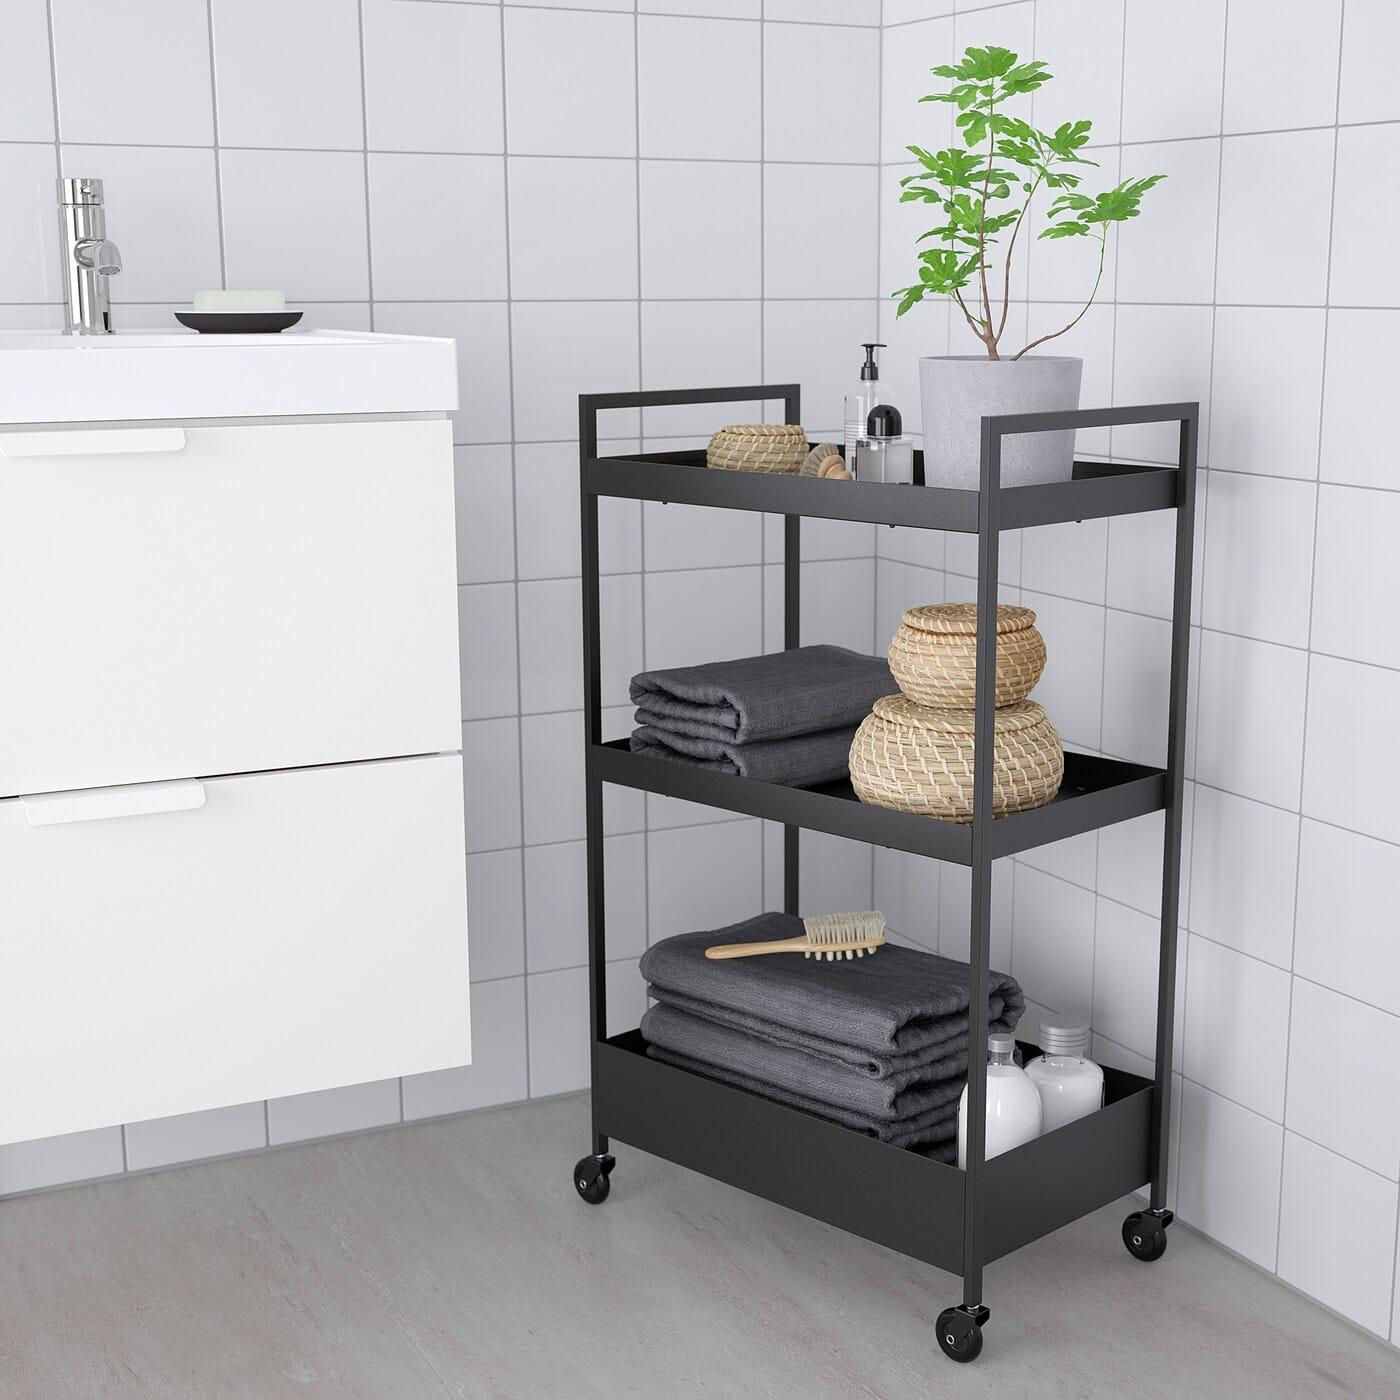 bathroom towel styling in black ikea nissaford trolley